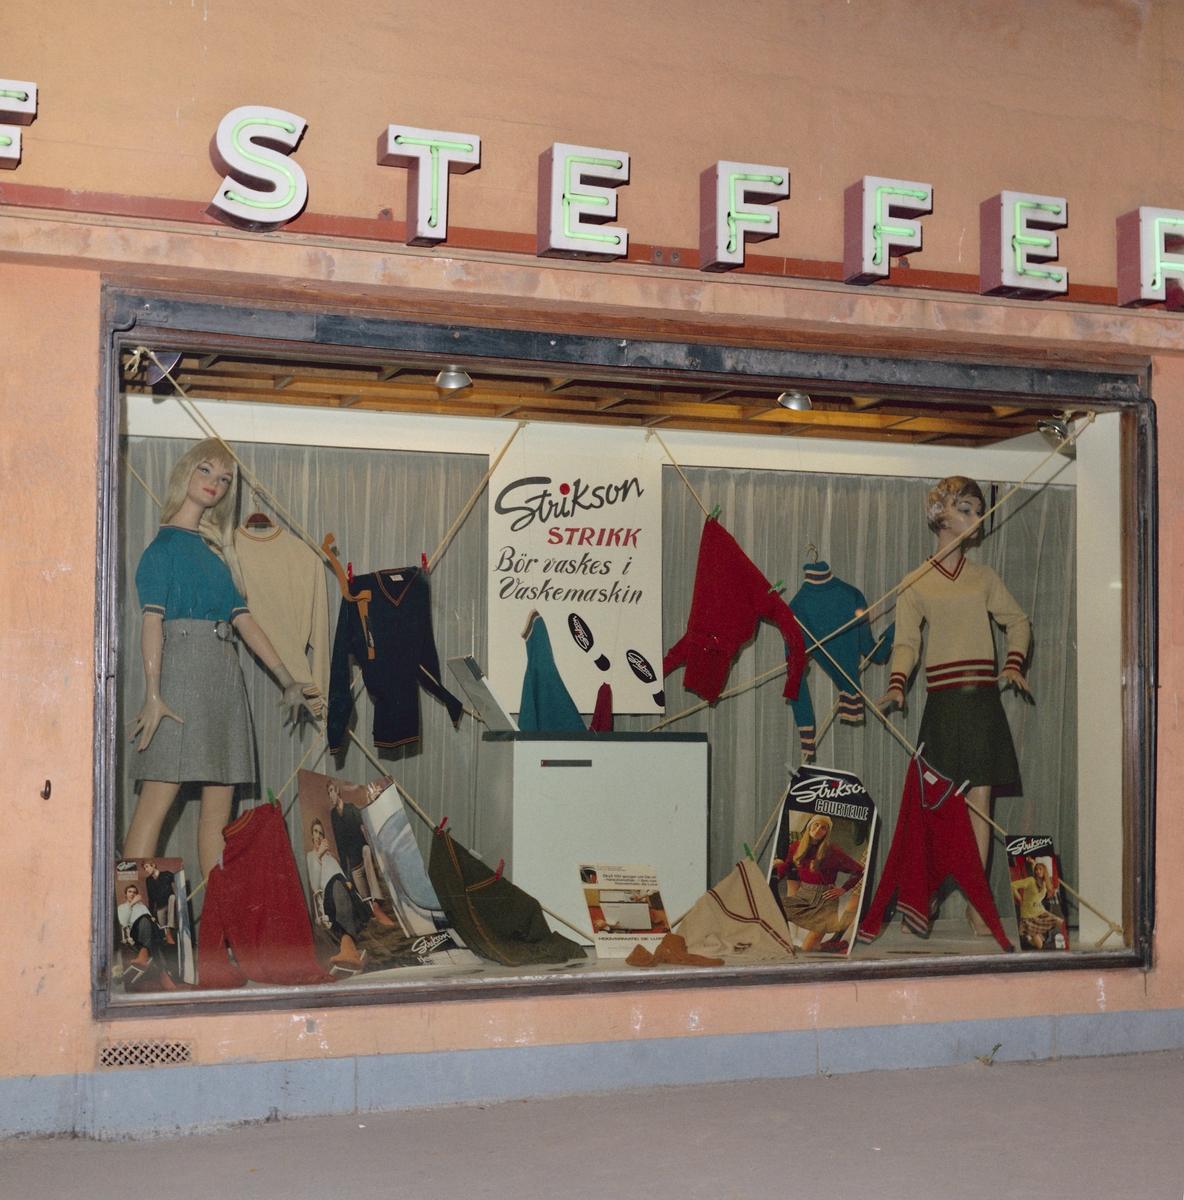 Butikkvinduer hos Stefferud på Strømmen